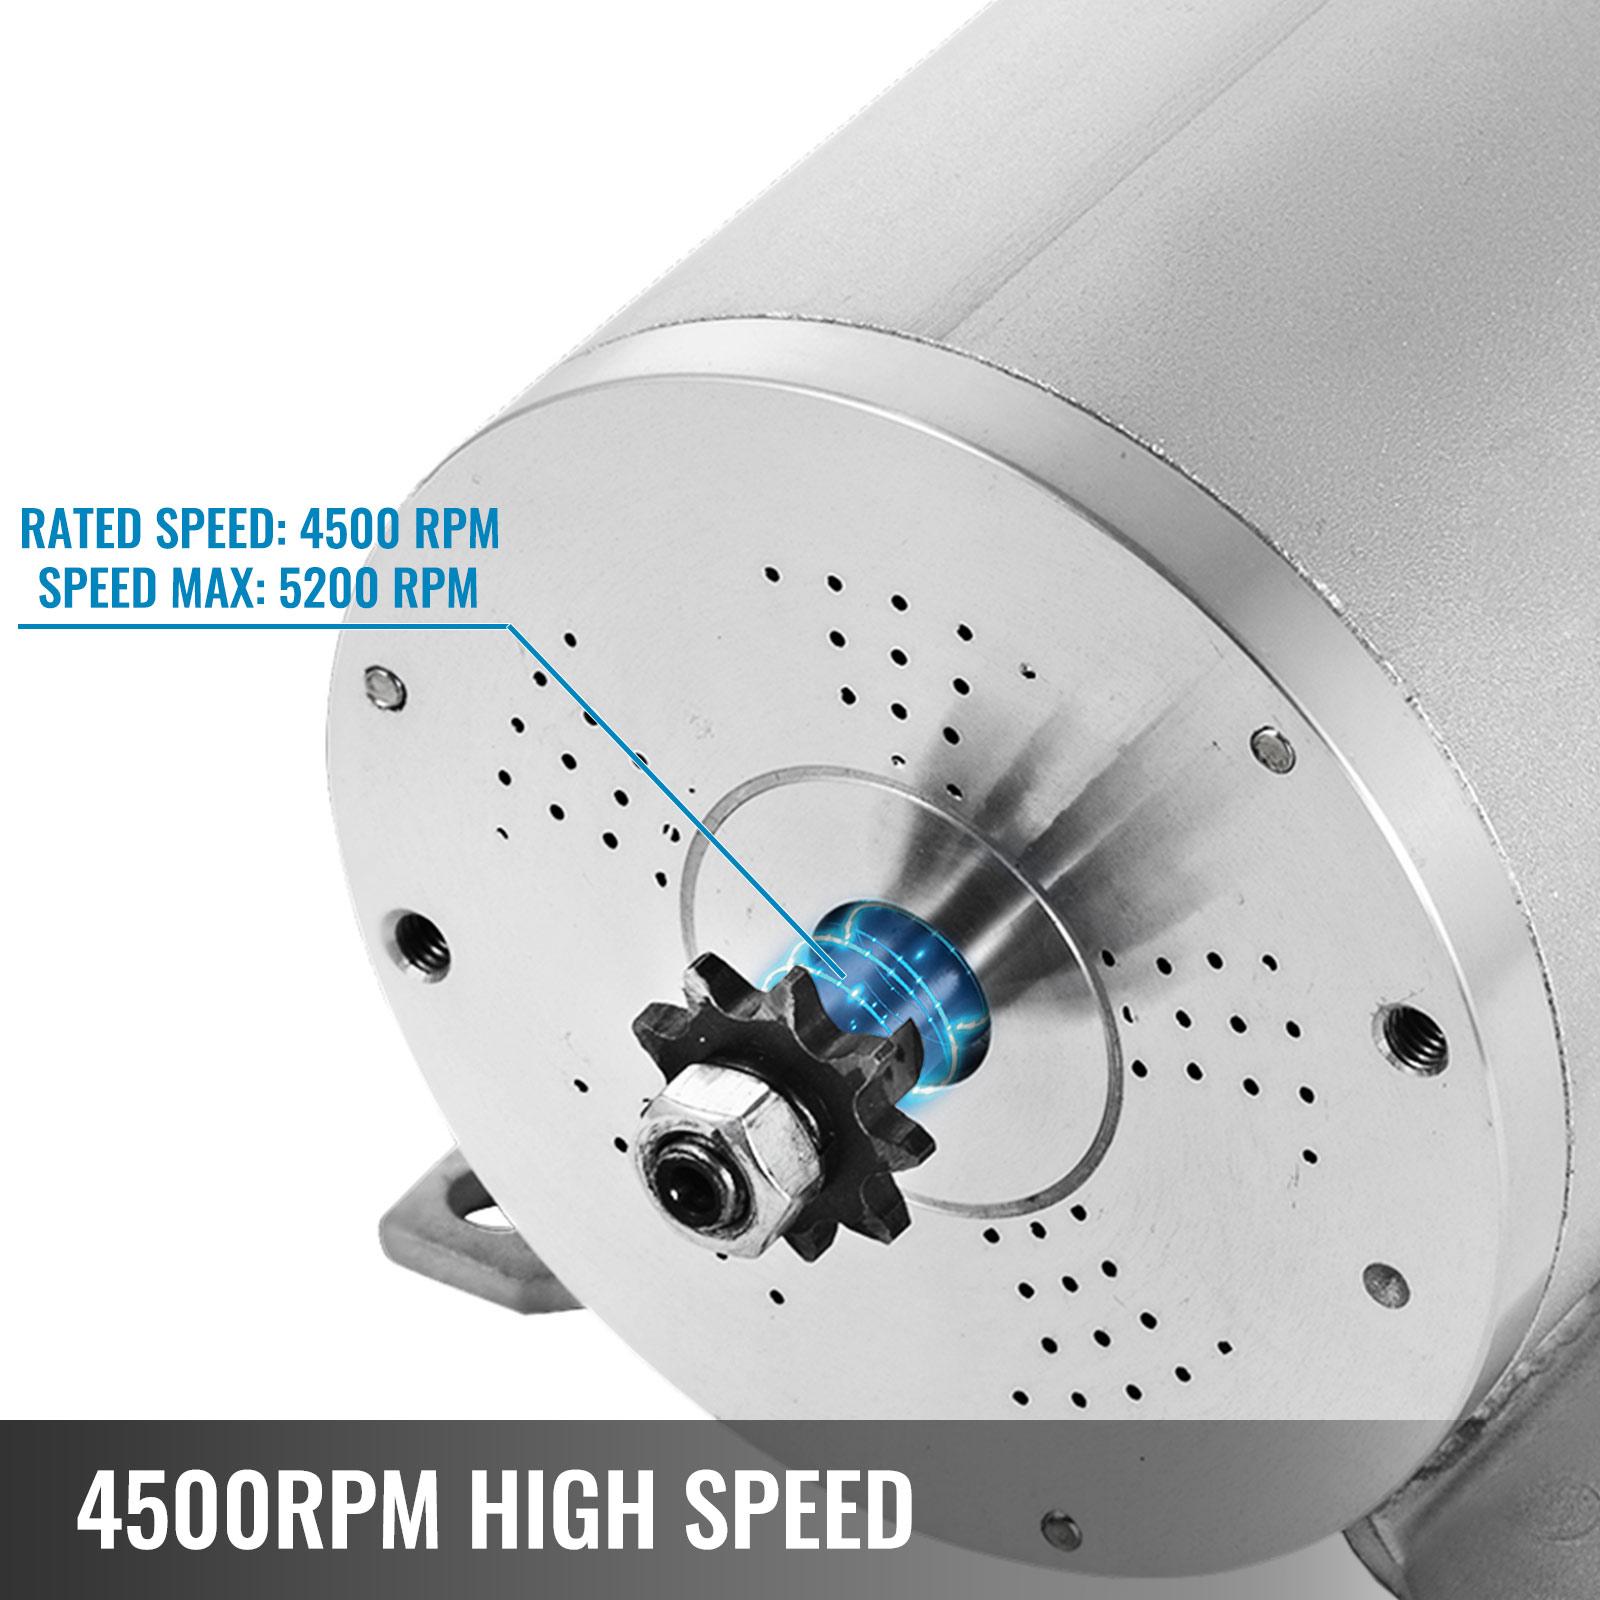 1800W-48V-DC-Brushless-Electric-Motor-Kit-f-Scooter-500-1800W-E-Bike-Go-Kart thumbnail 124